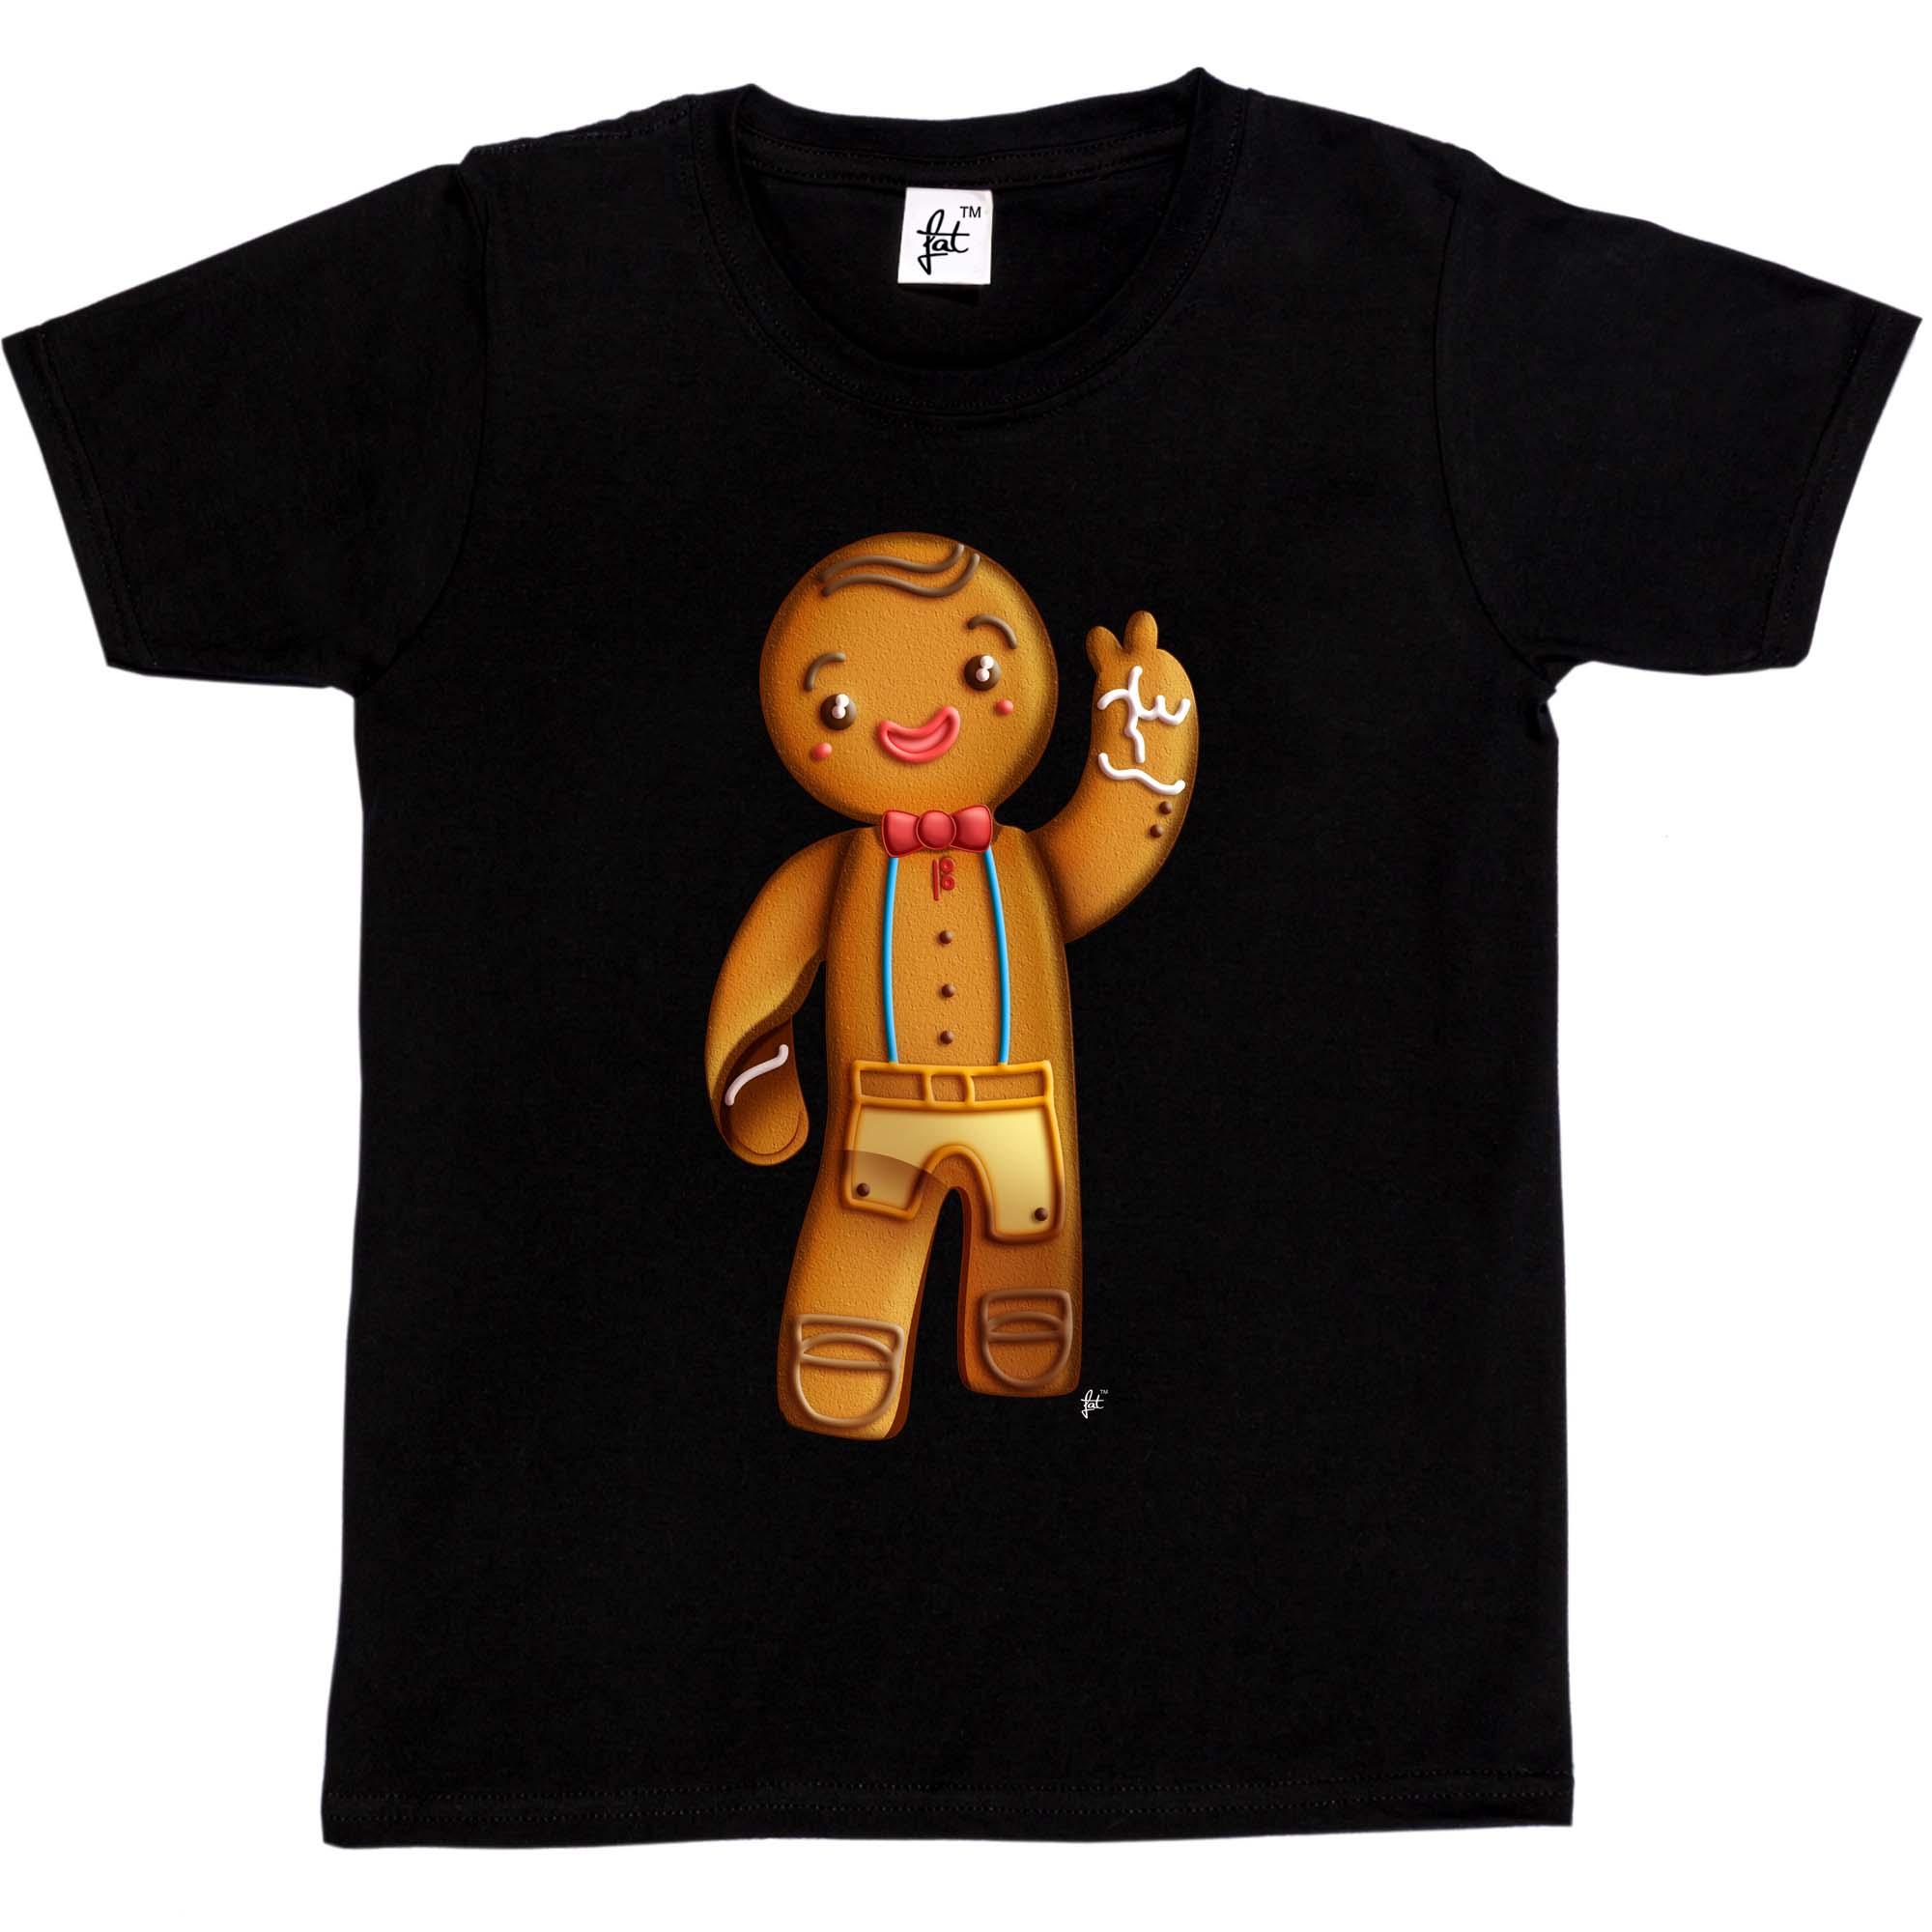 Happy Gingerbread Man Smiling /& Waving Kids Boys Girls T-Shirt